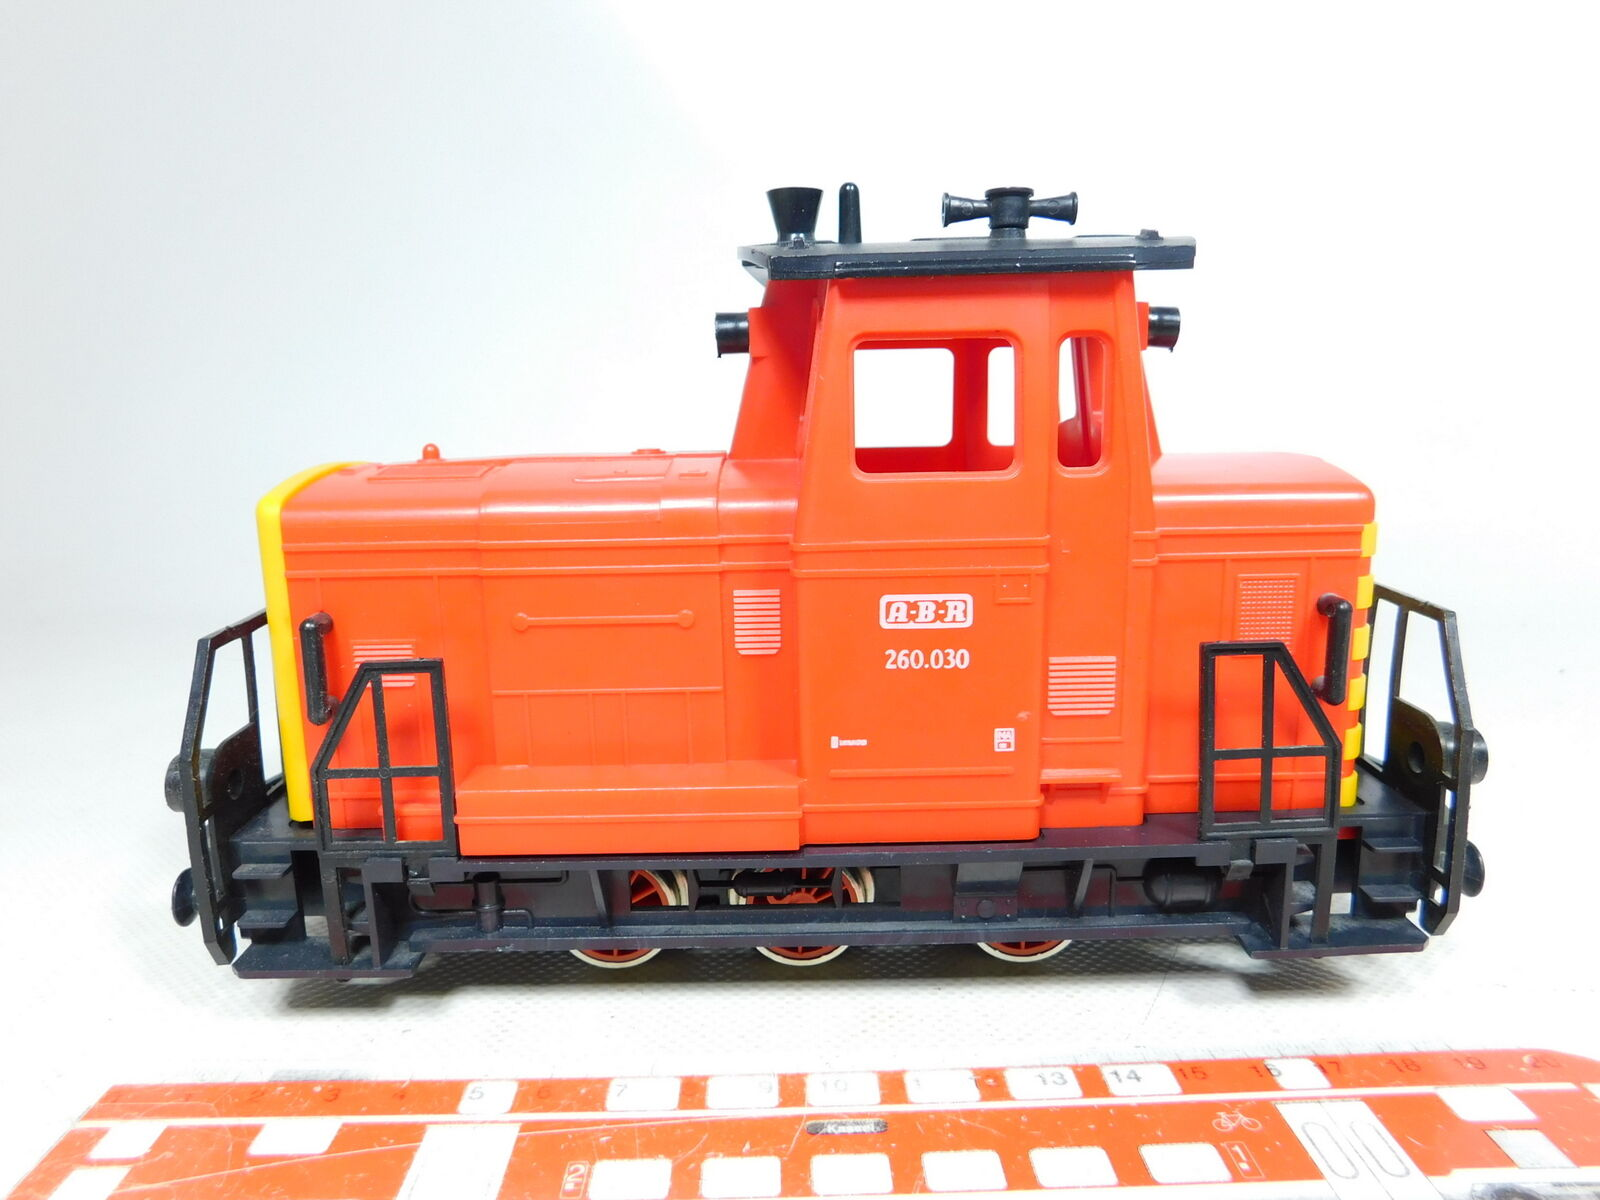 BX473-1Faller E-Train o Gauge   Dc Diesel Locomotive 260.030 Abr,Small Parts